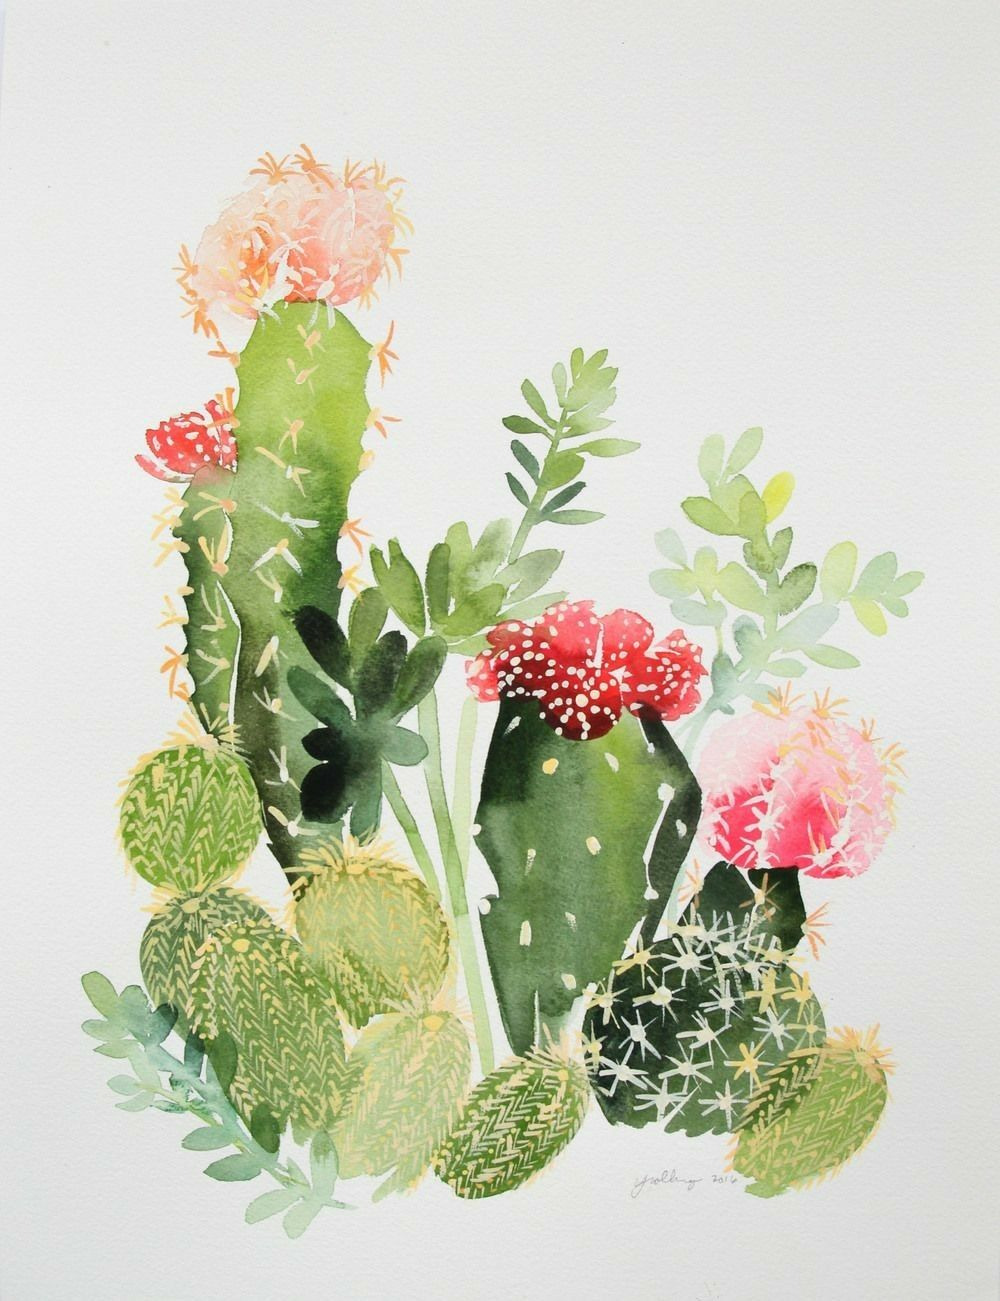 Pin by LAMYA .K on Watercolors | Pinterest | Cacti, Watercolor and ...